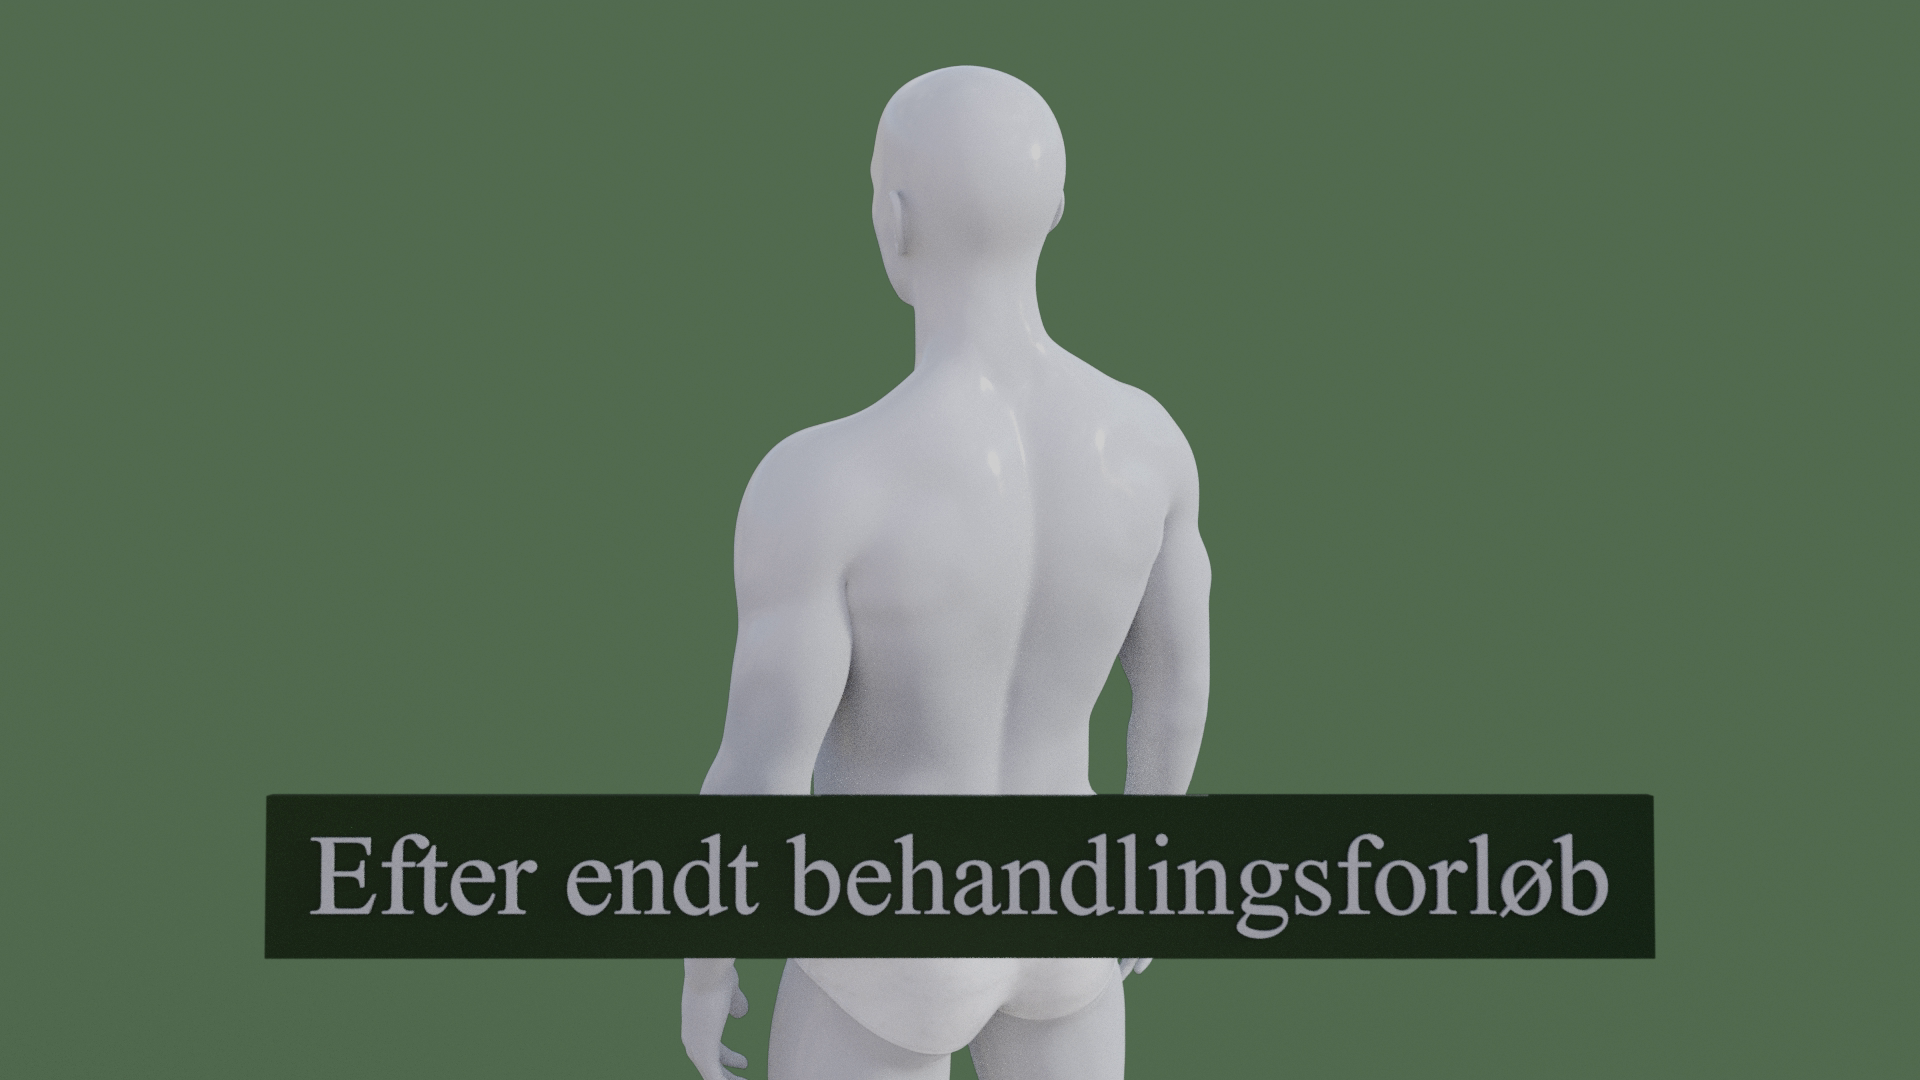 Billedet viser den samme 3D figur, men uden rygsmerter. 3D figuren er helbredt.